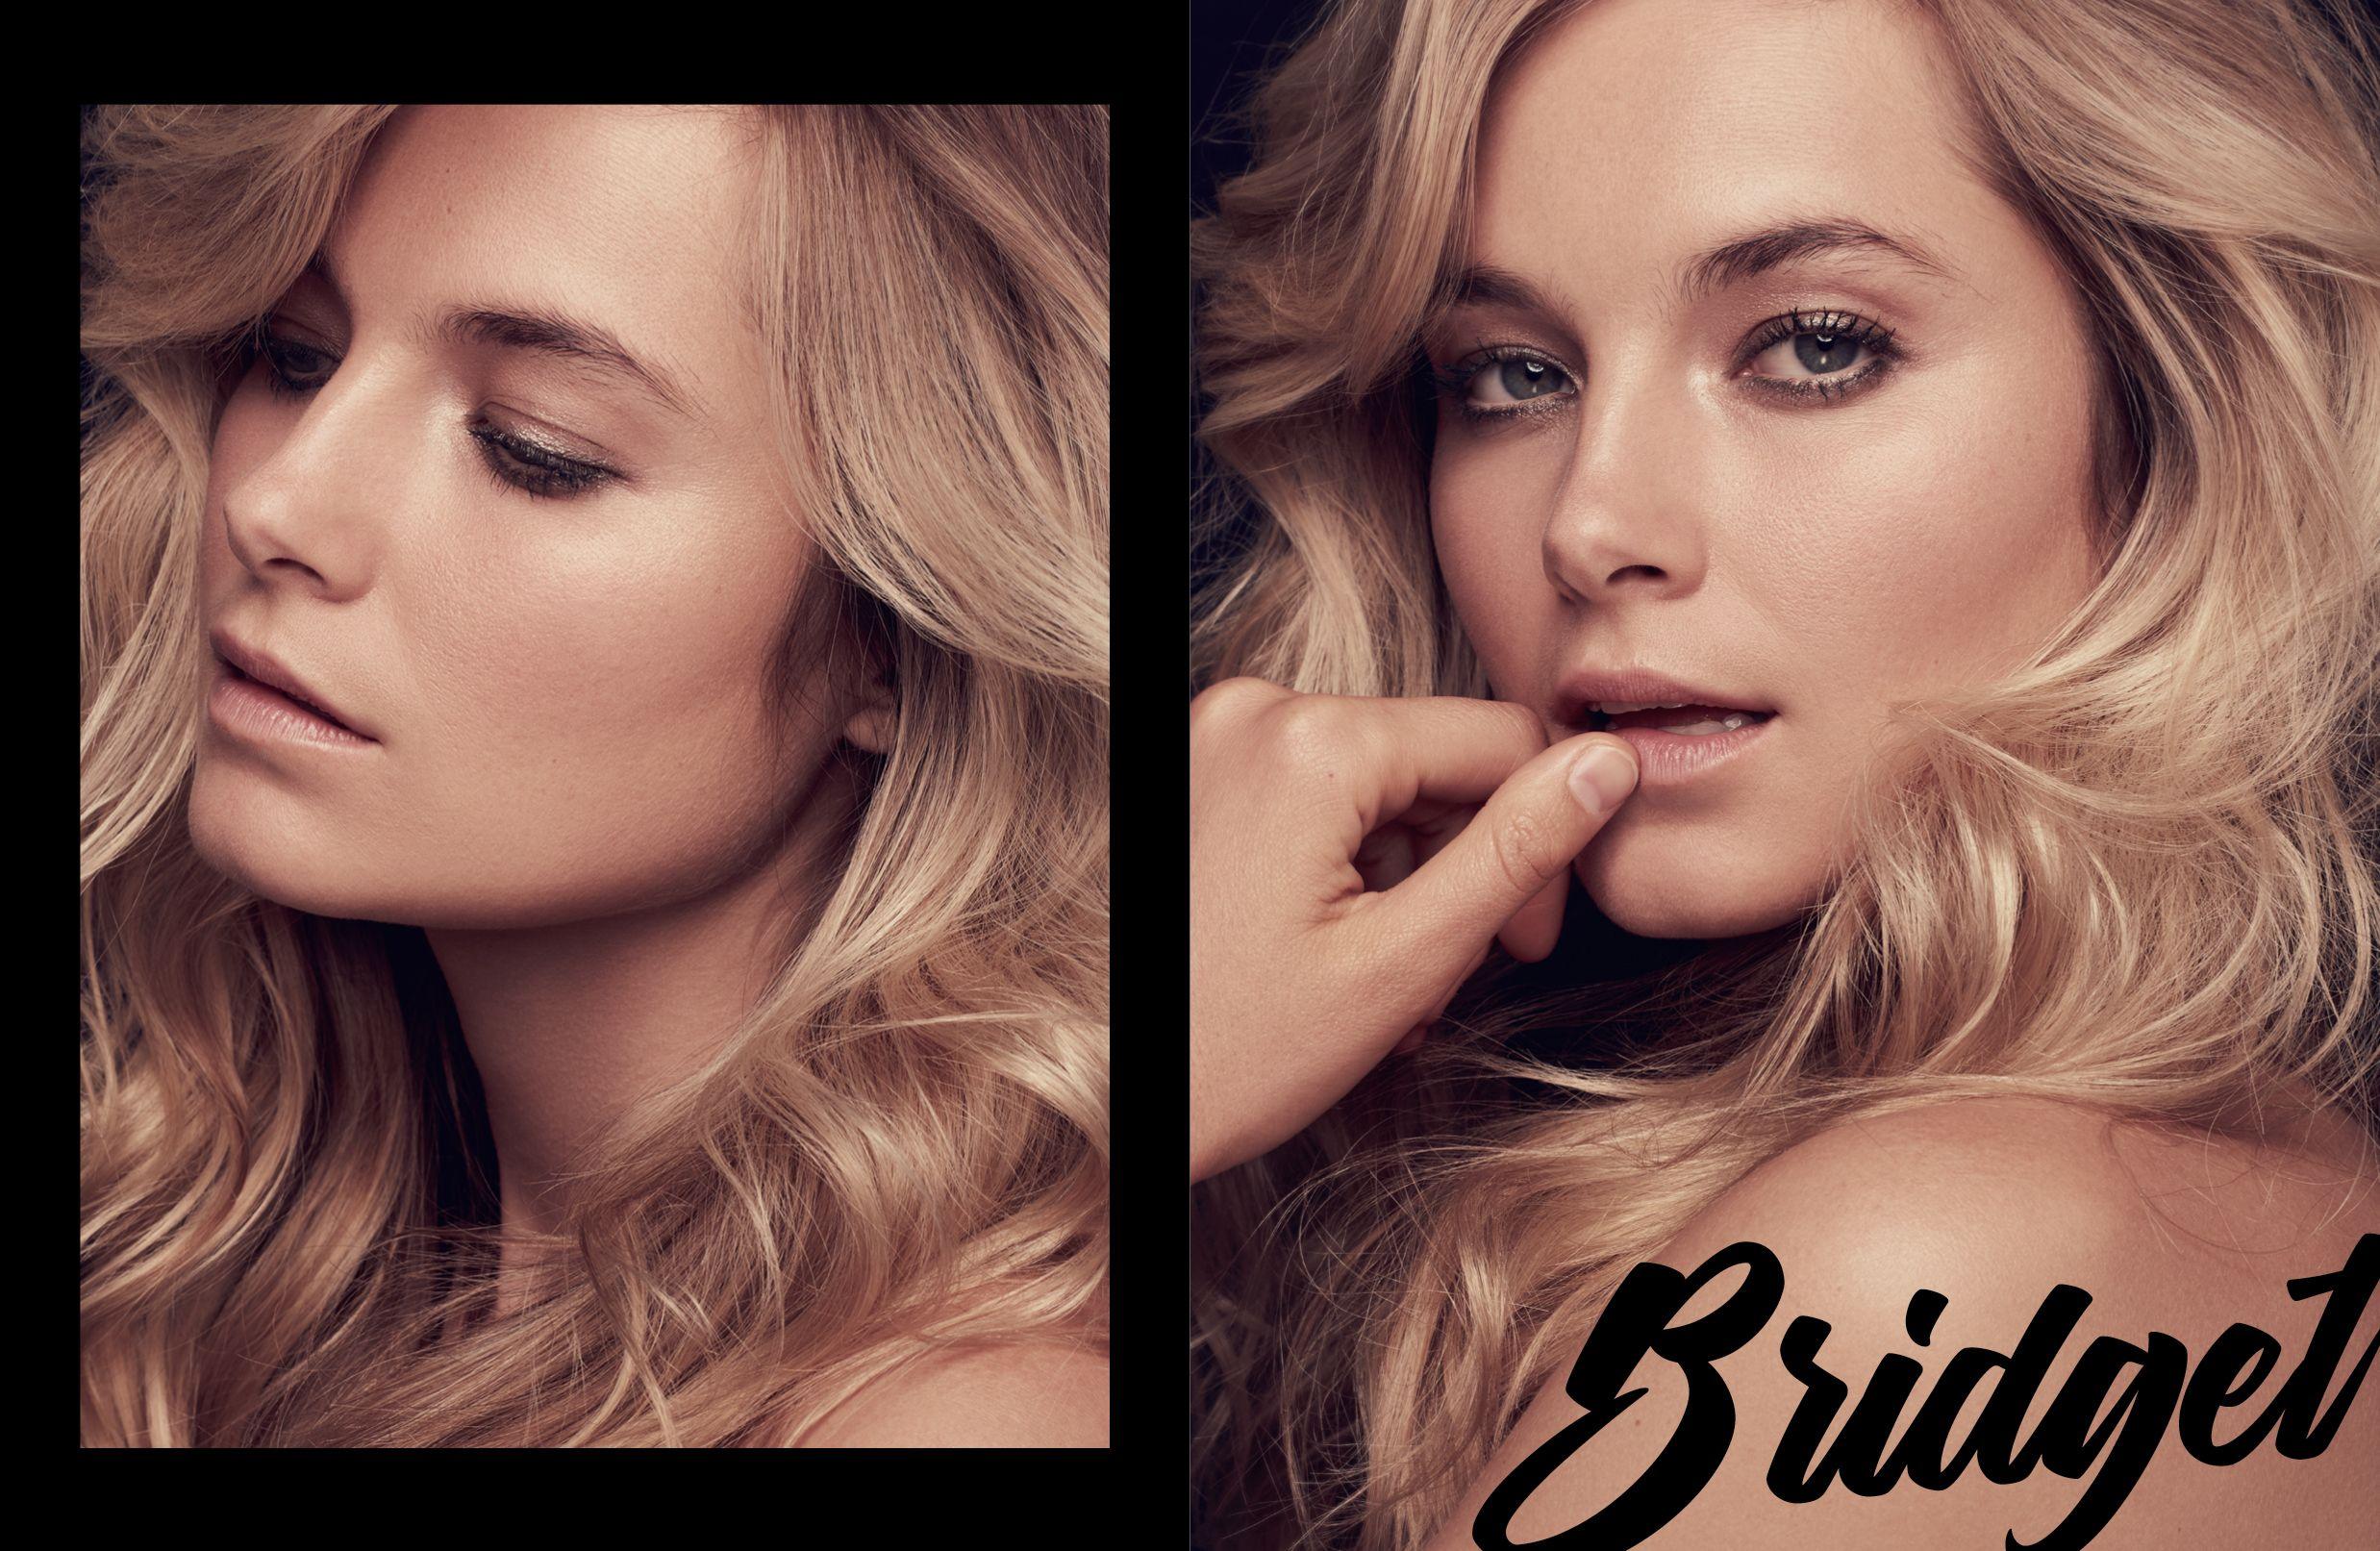 Bridget_Story5.jpg